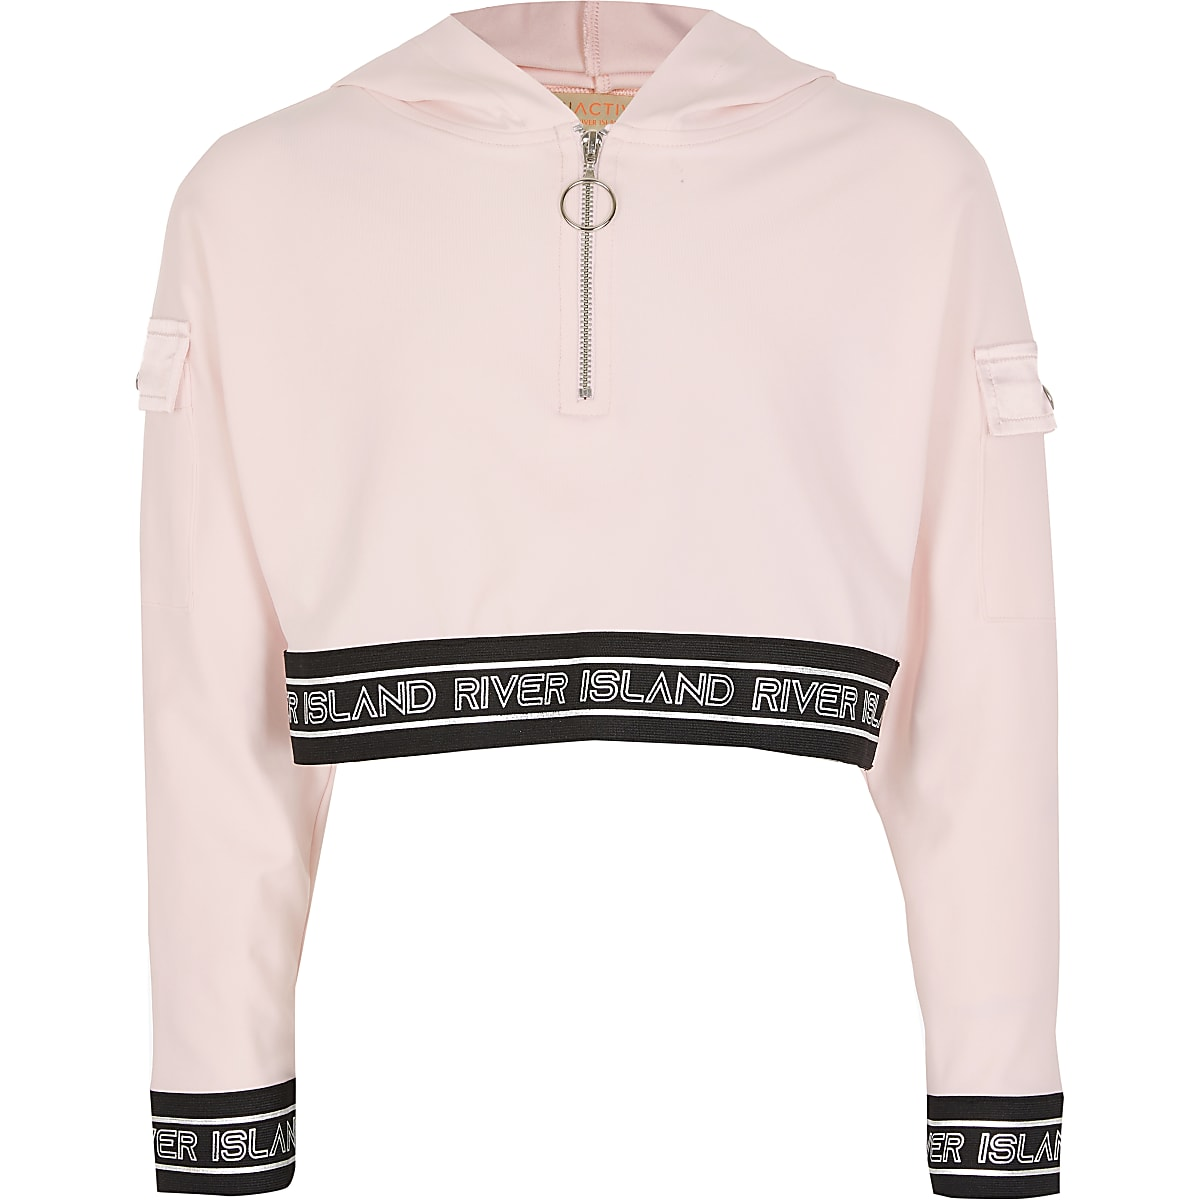 Girls RI Active pink sweatshirt outfit